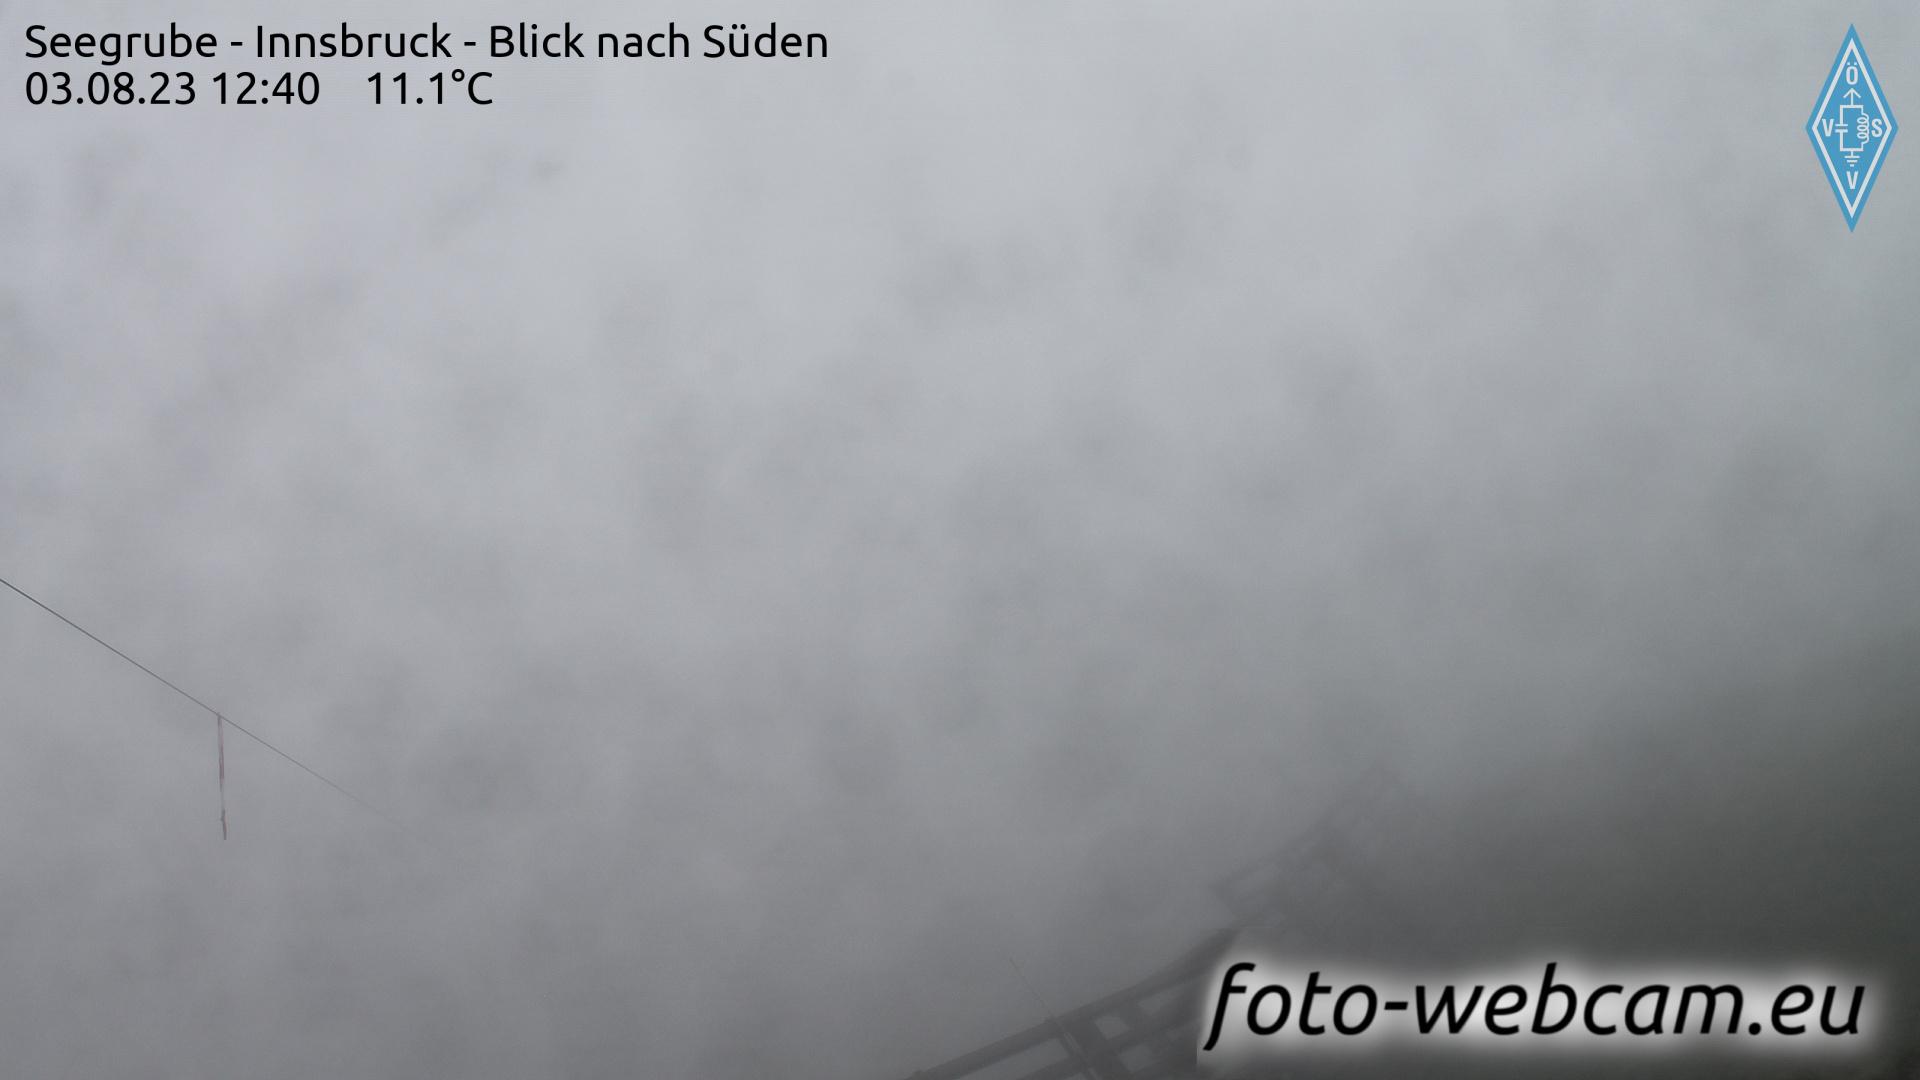 Innsbruck Wed. 12:18